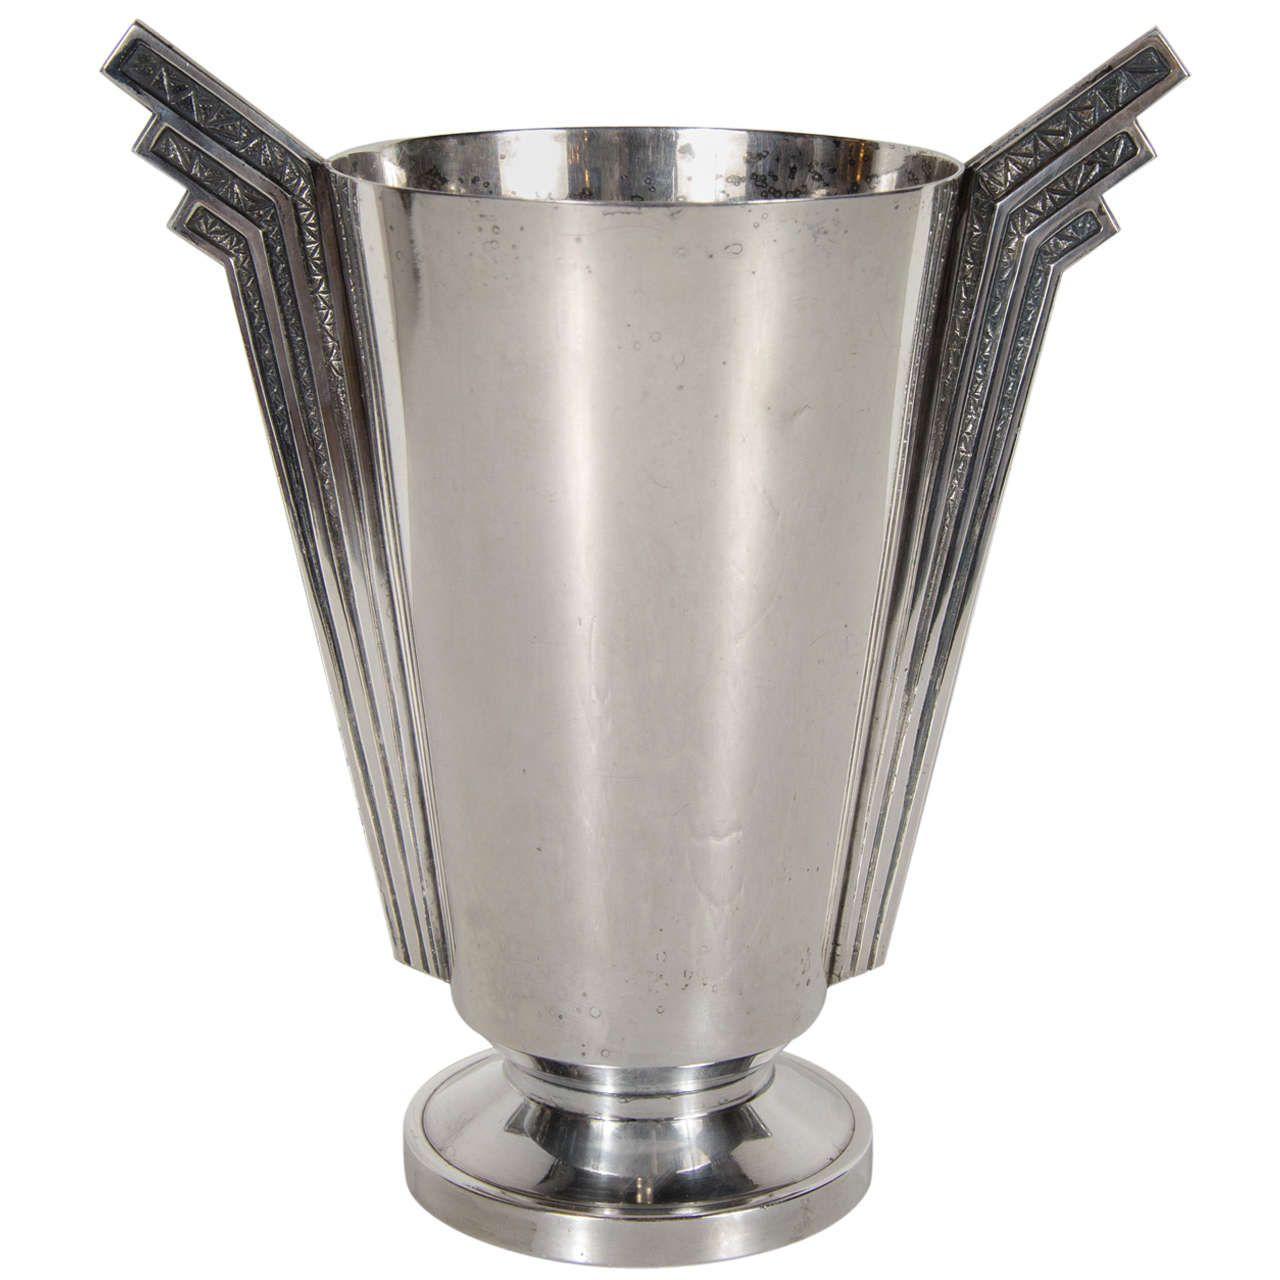 Stunning Art Deco Skyser Style Silver Plate Vase